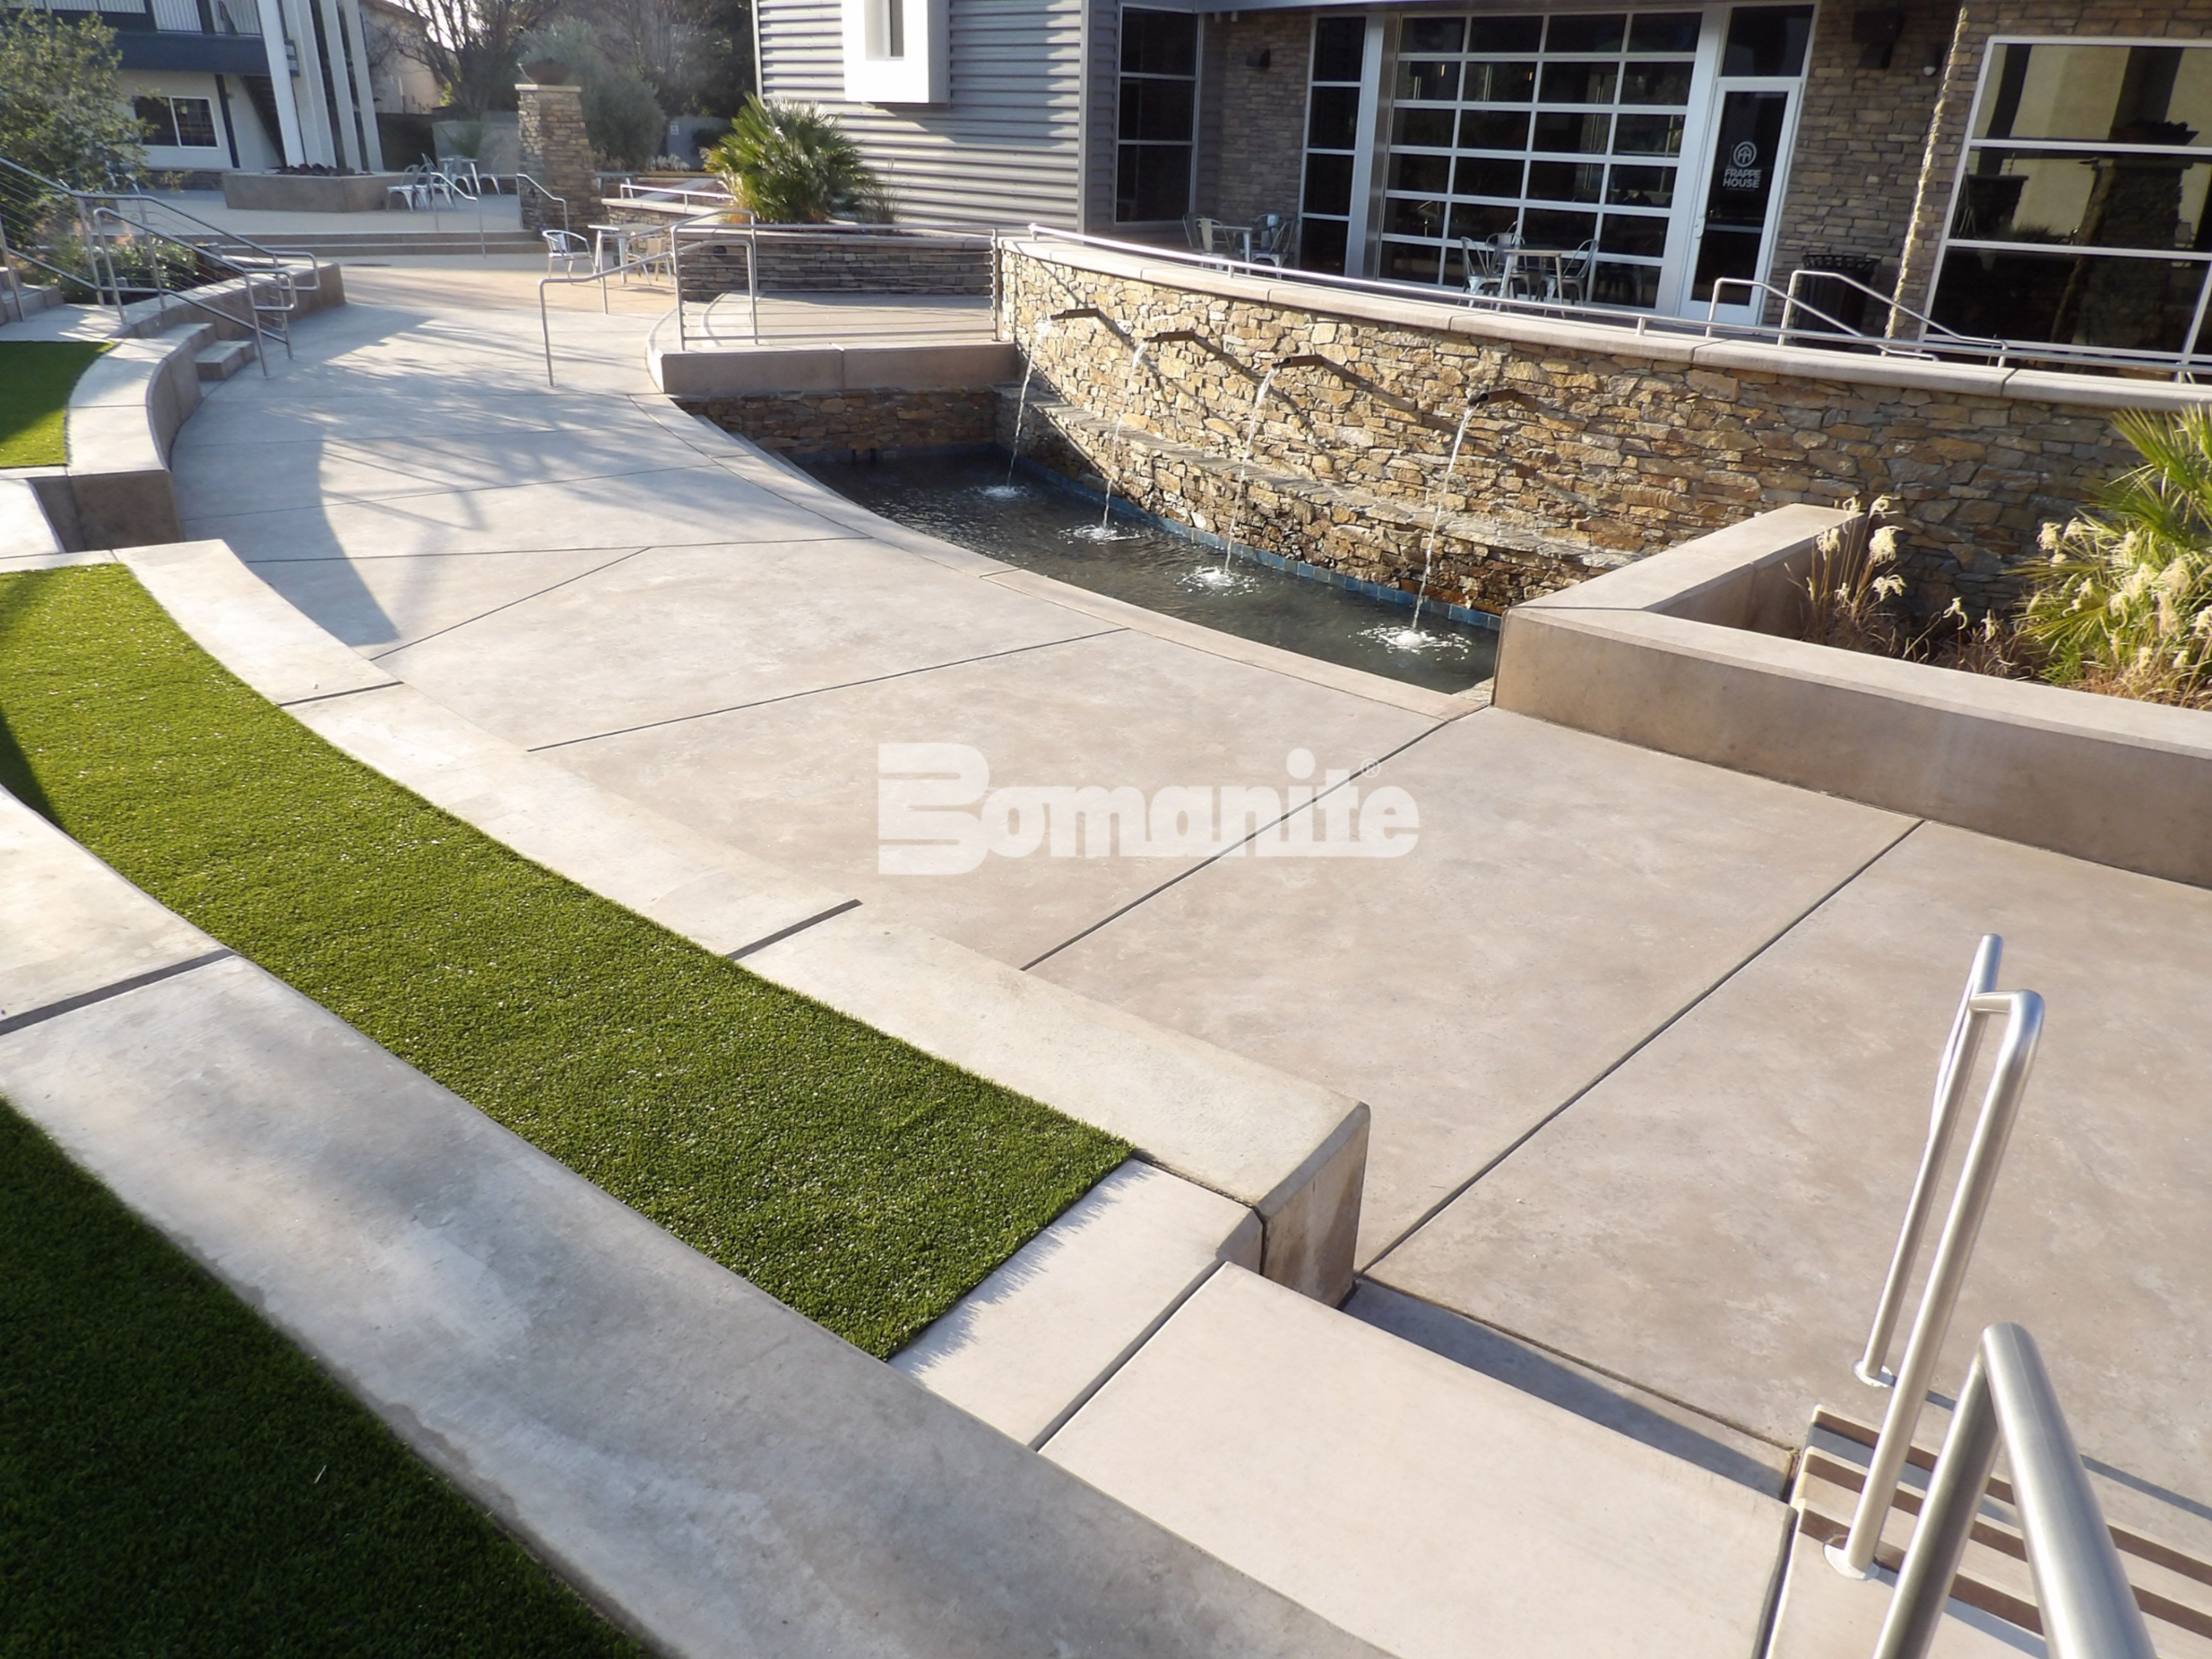 A multi-purpose decorative concrete plaza using Bomanite Exposed Aggregate Systems with Bomanite Sandscape Refined Antico at CrossCity Church, formerly known as Northside Church, in Fresno, CA.